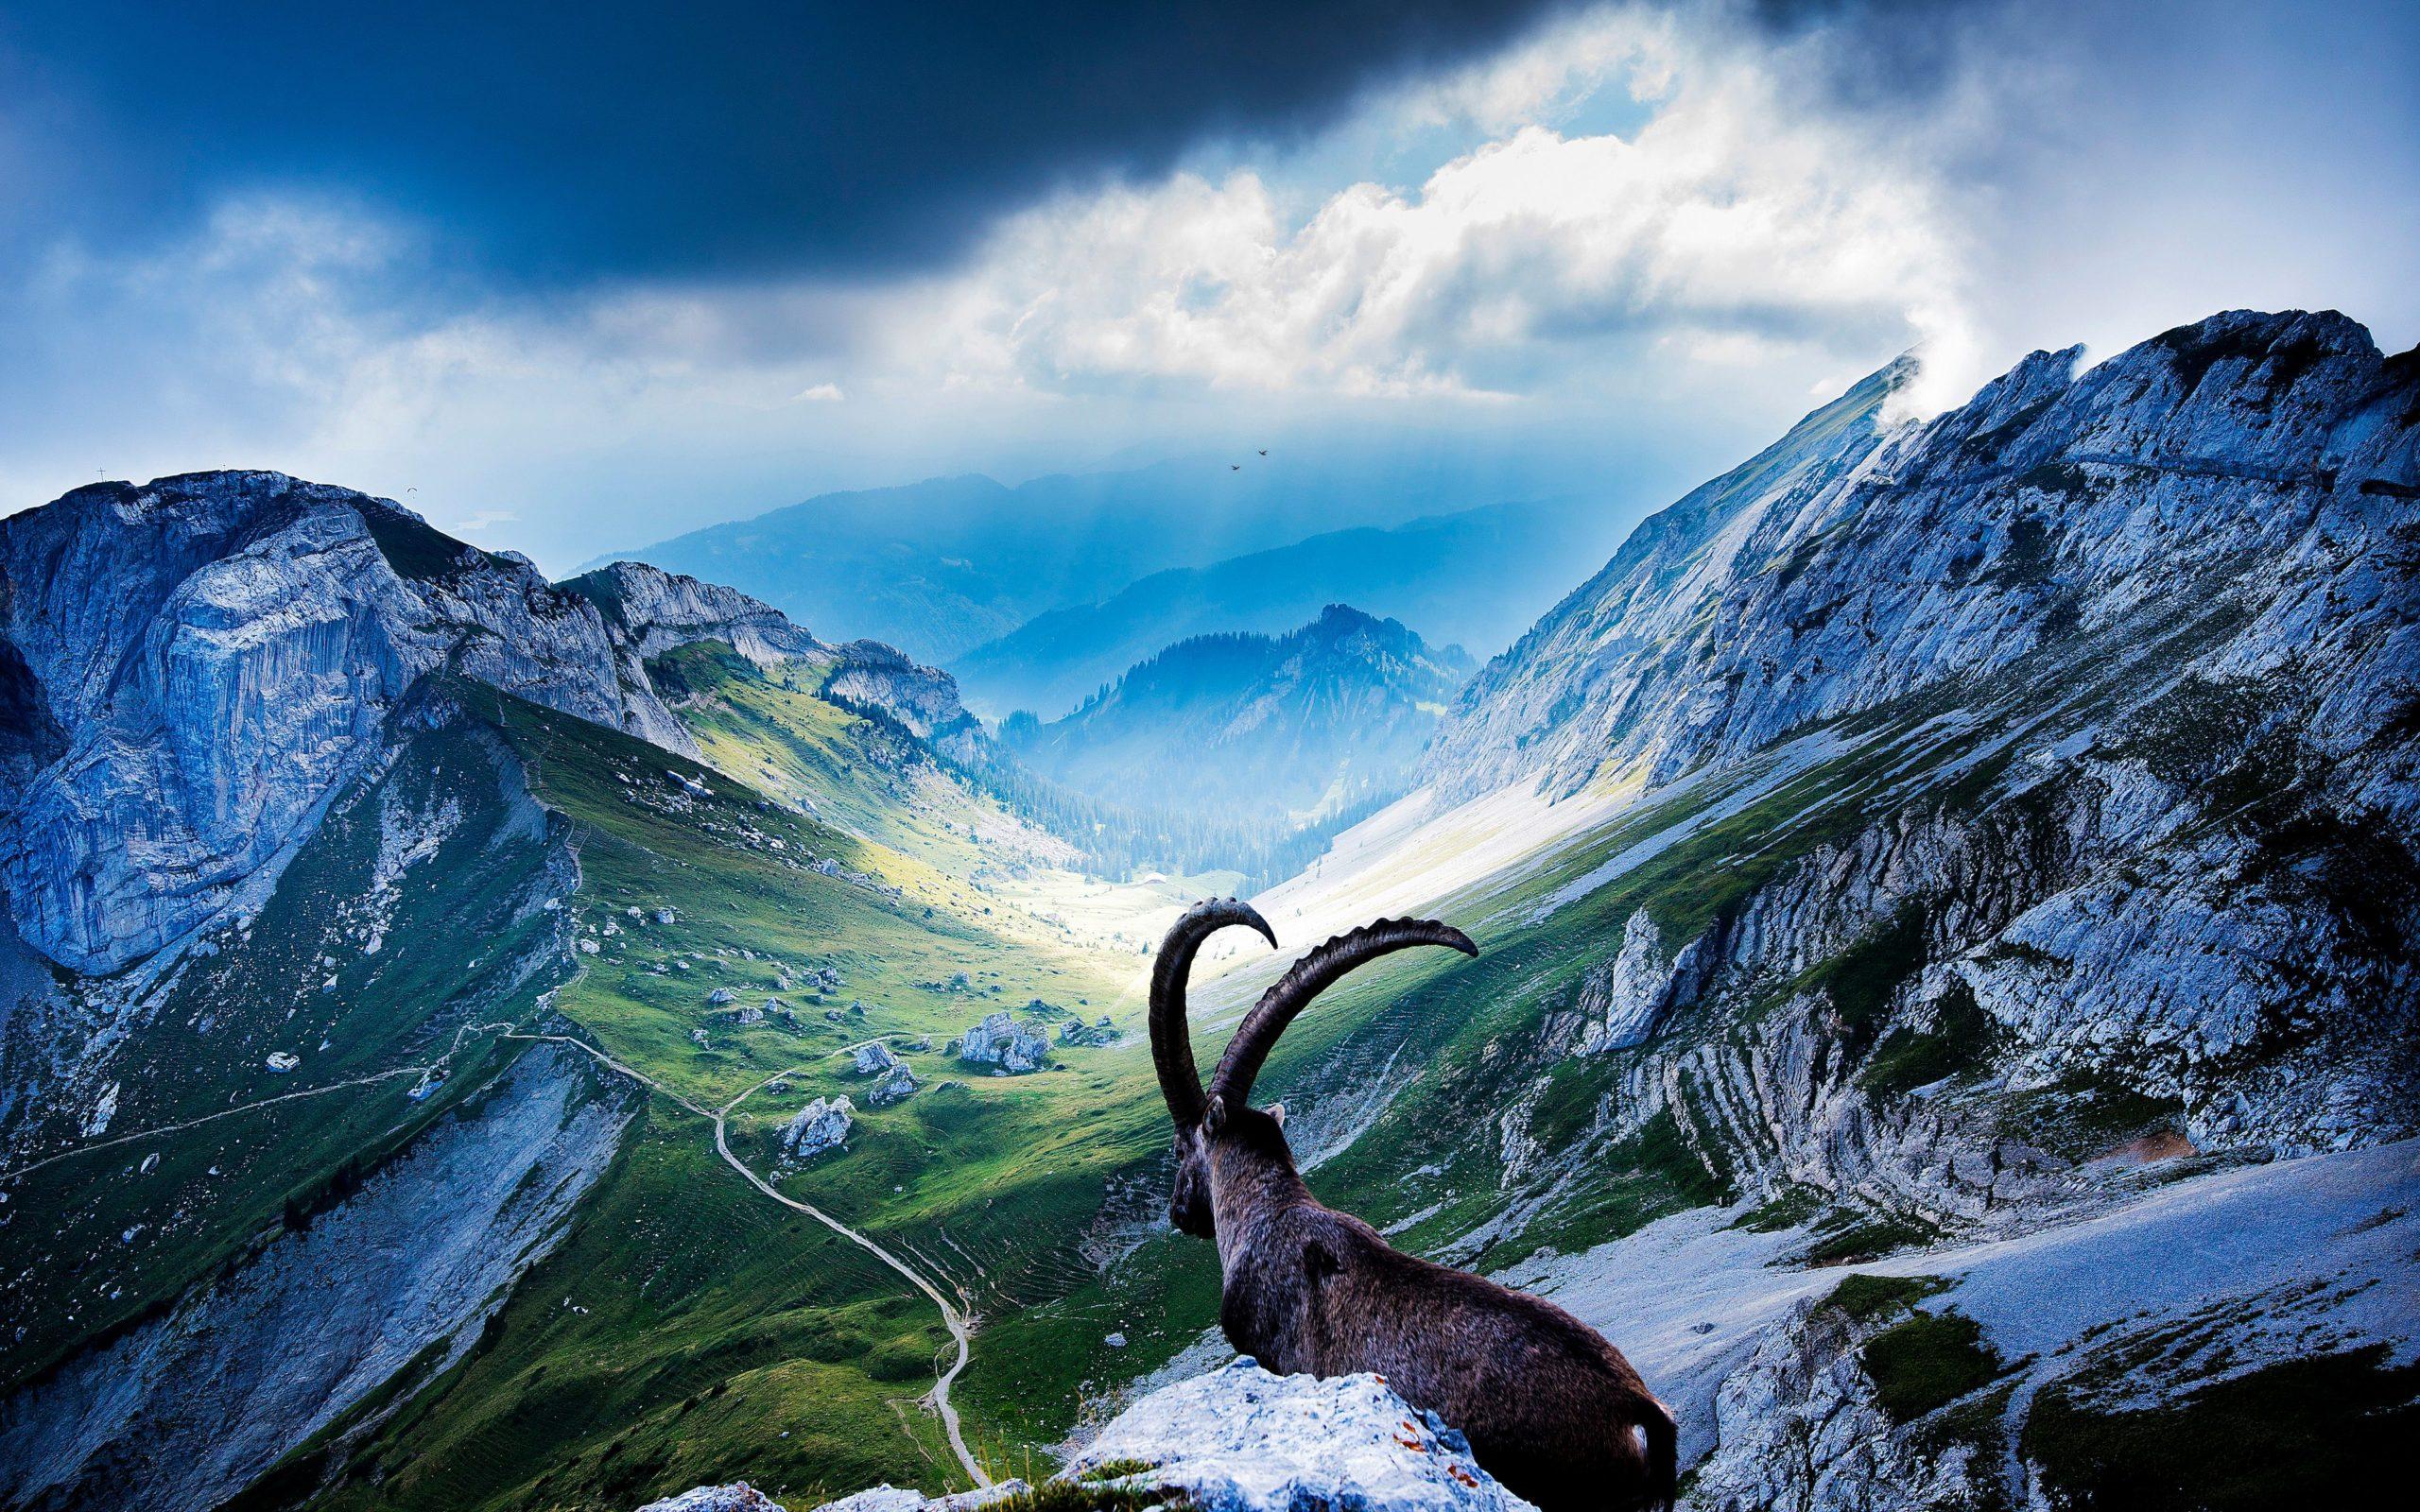 beautiful pictures of switzerland